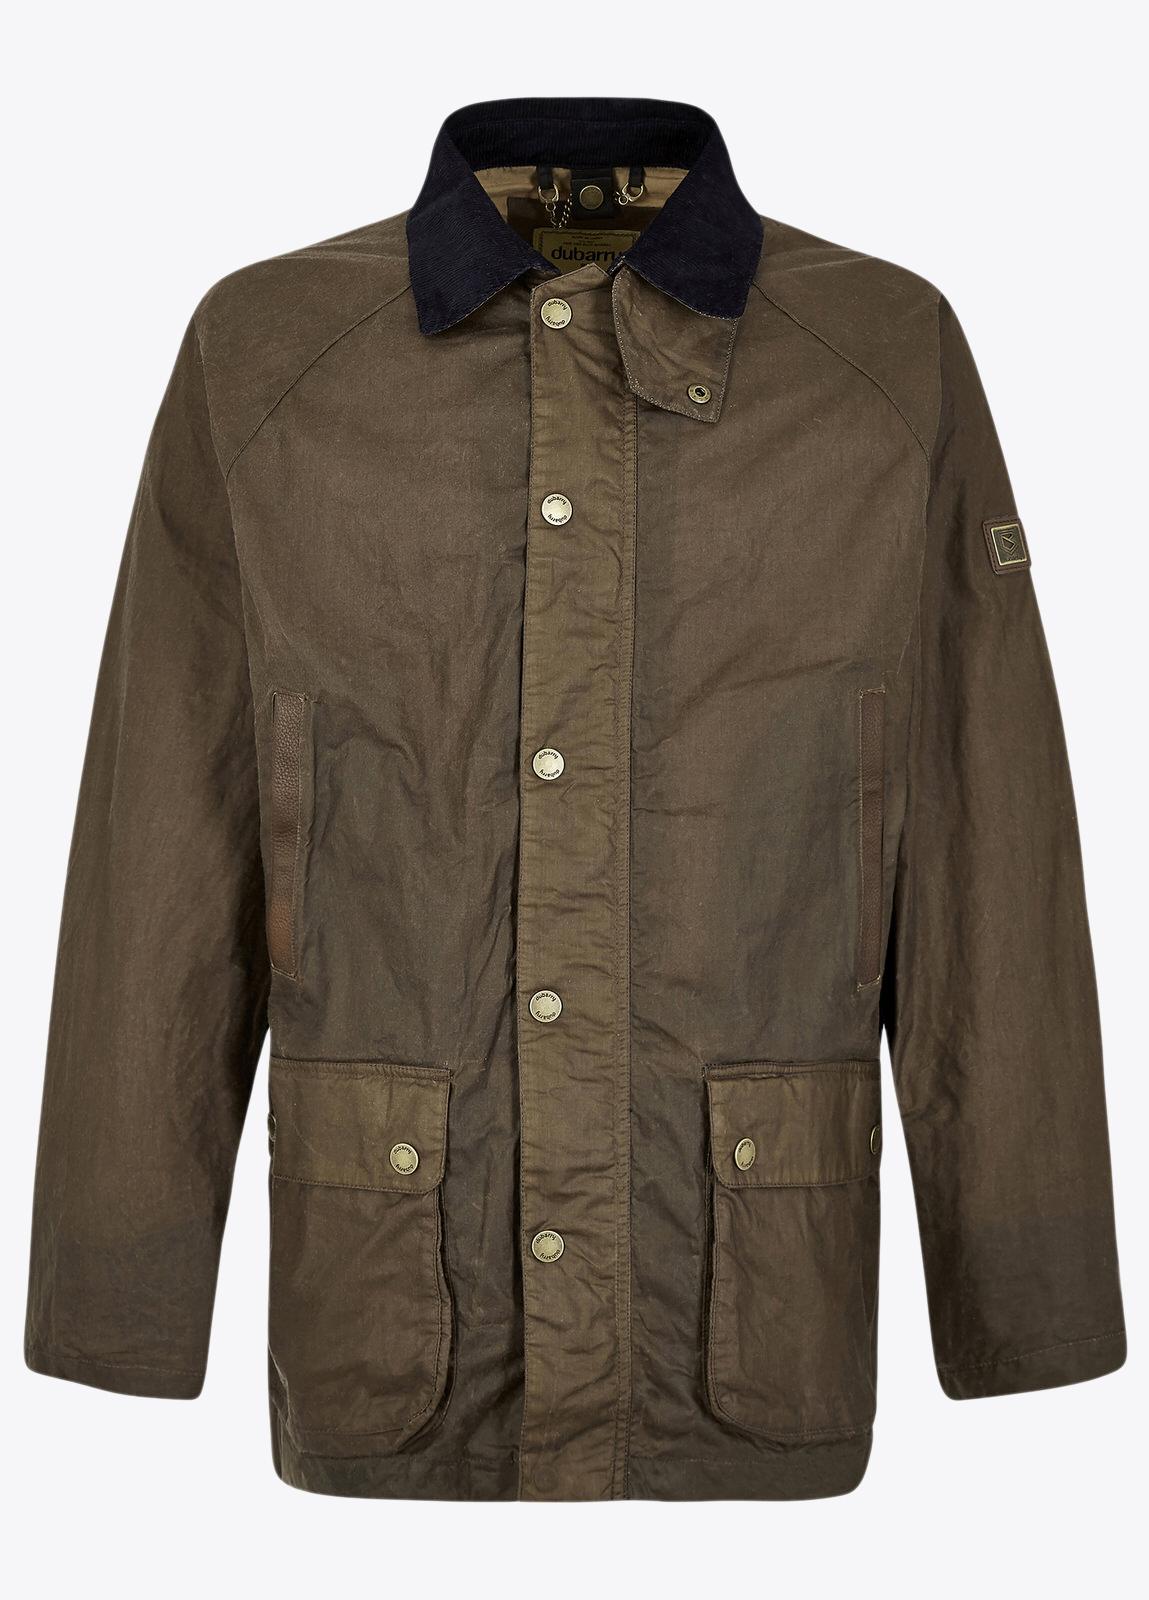 Mountbellew Wax Jacket - Ginger